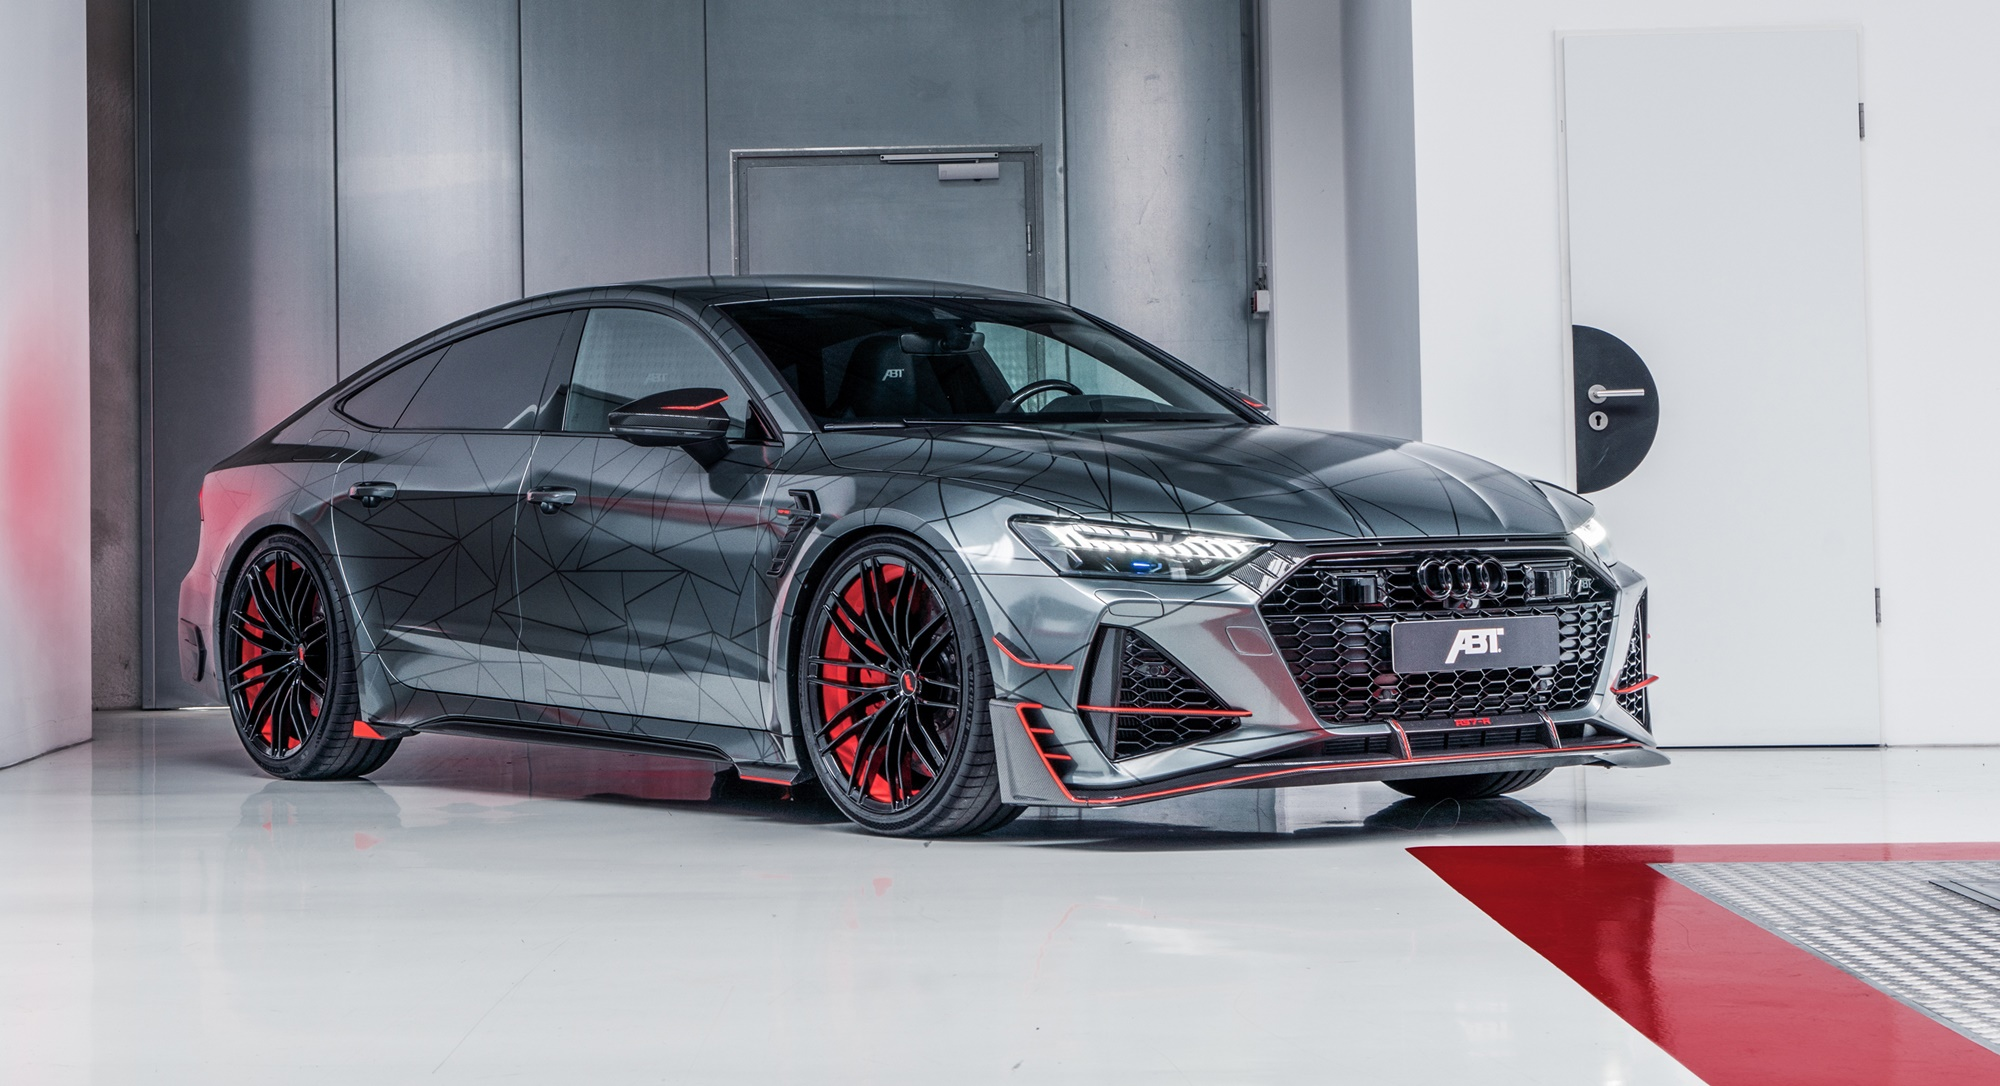 ABT tuned Audi RS7 Twin Turbo naar 730 paardenkracht 8